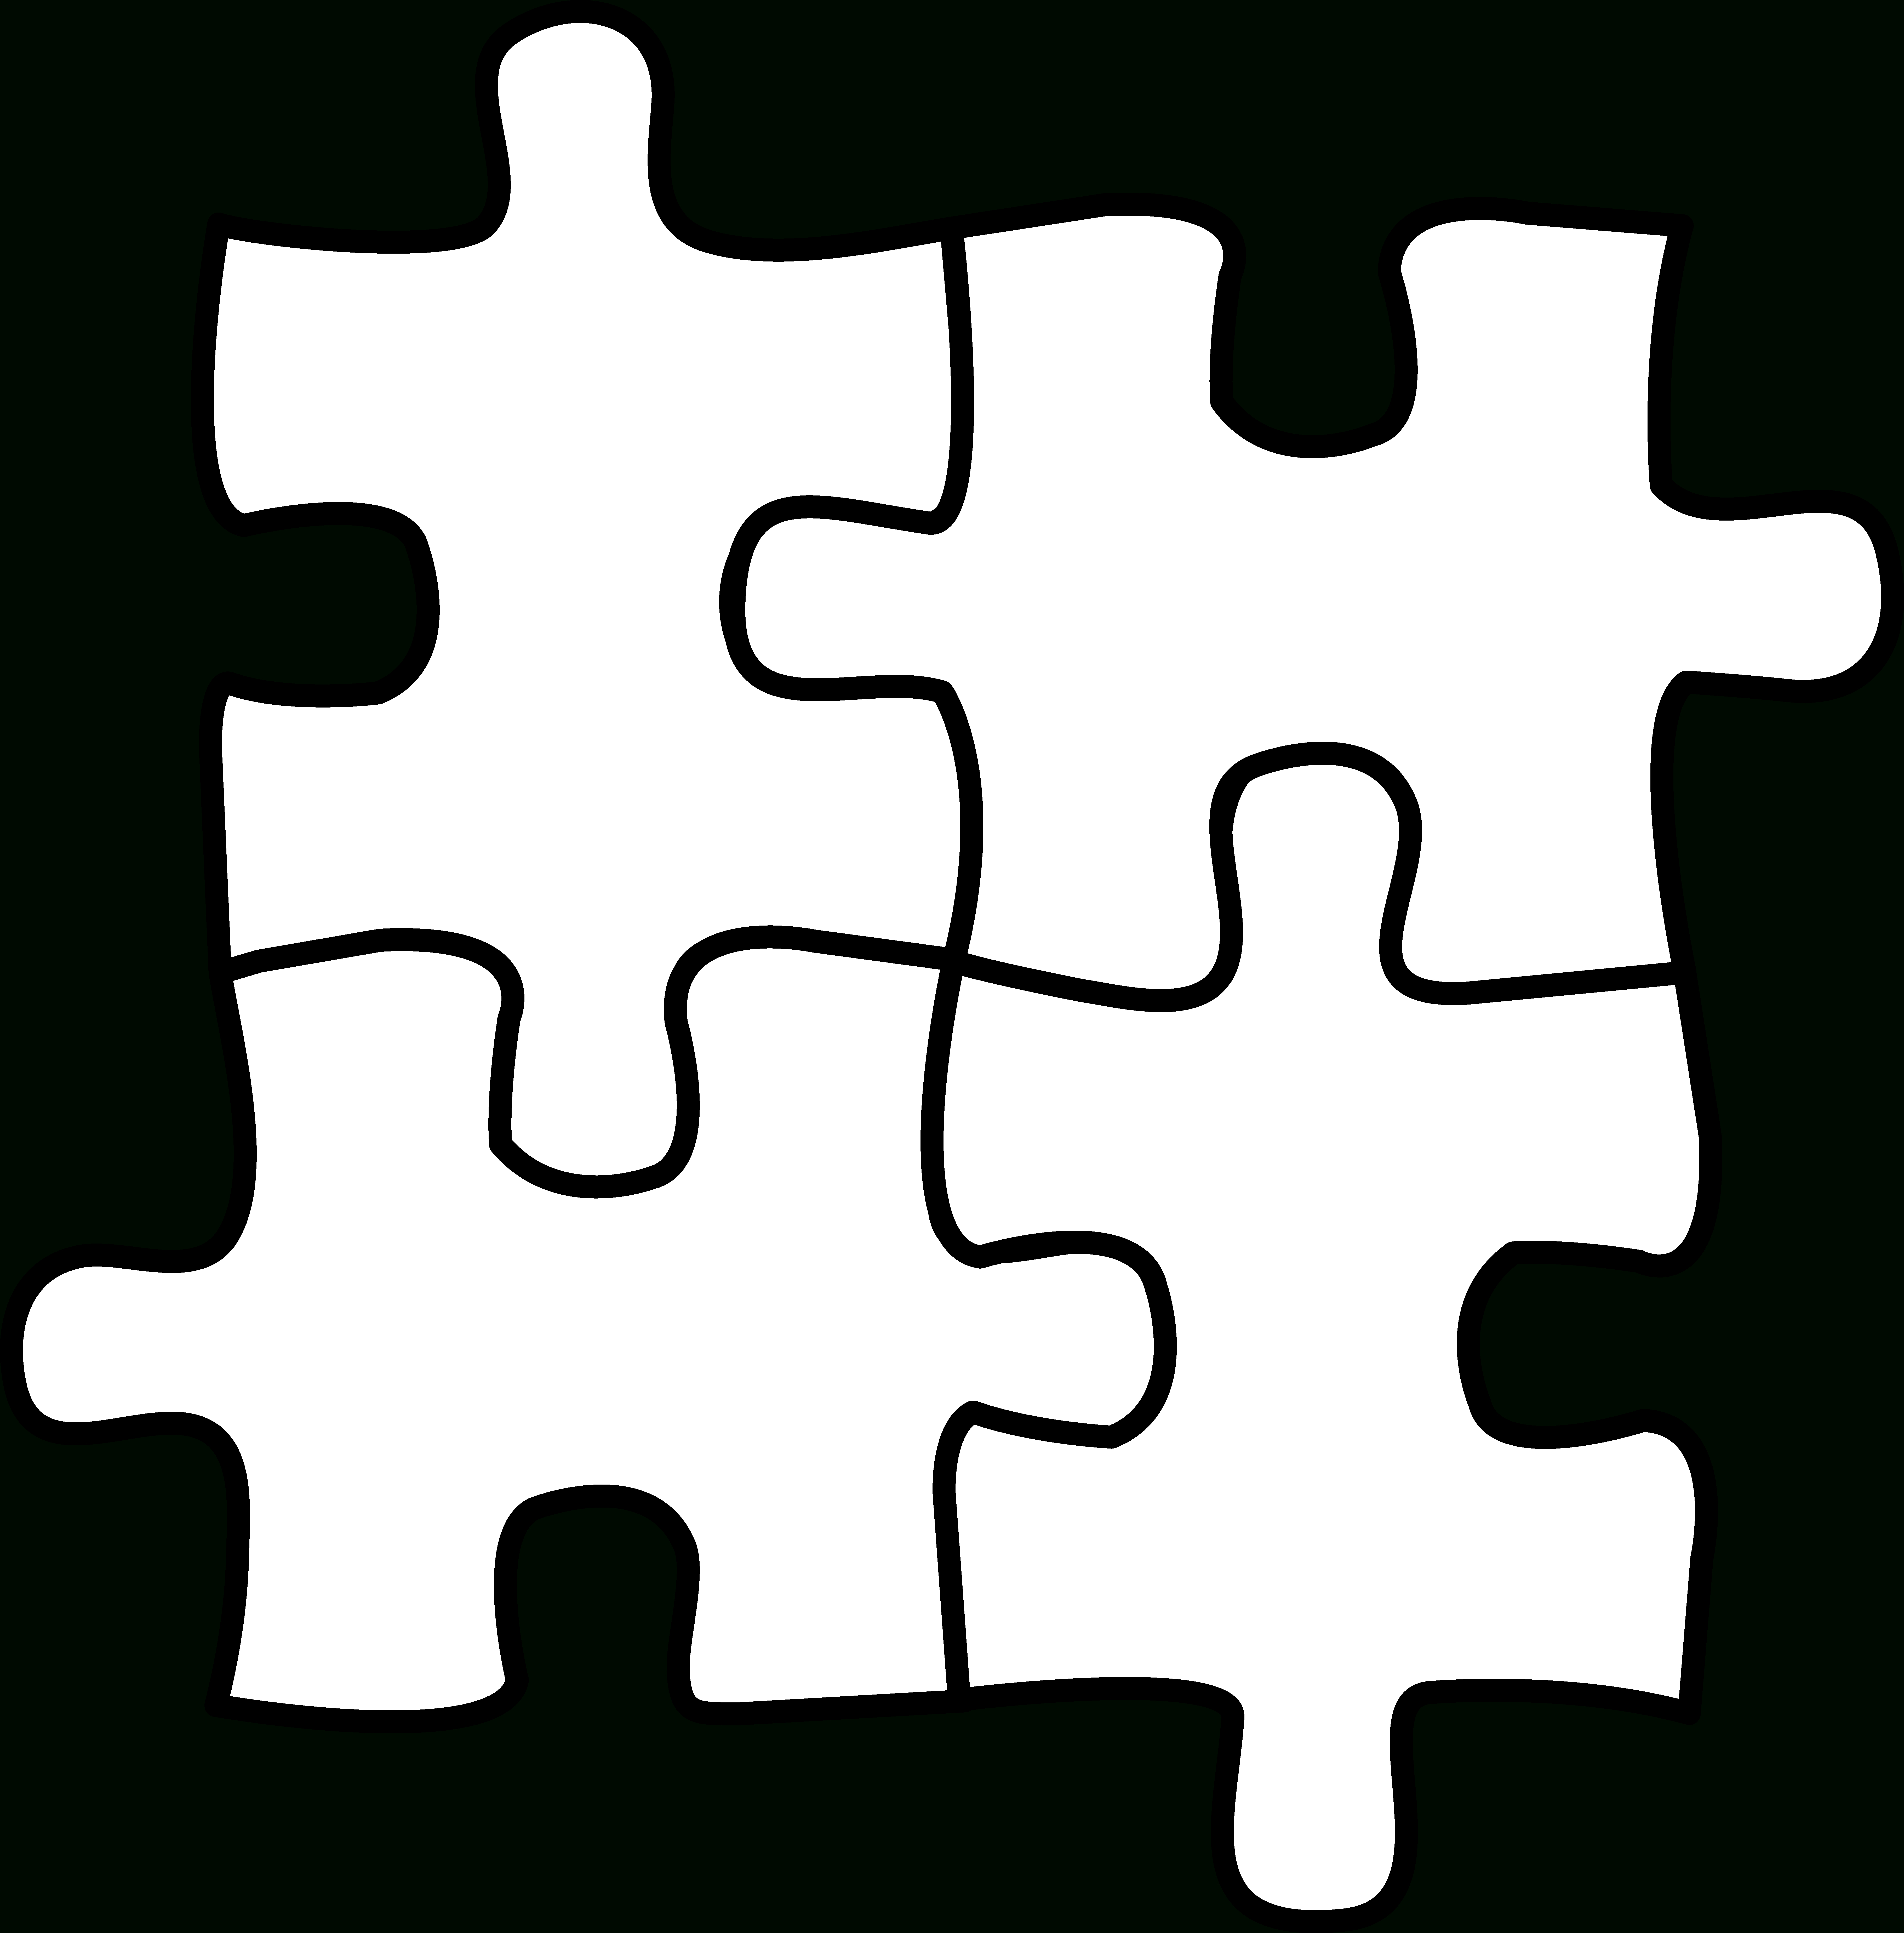 Autism Puzzle Piece Coloring Page - Coloring Home - Free Printable Autism Puzzle Piece